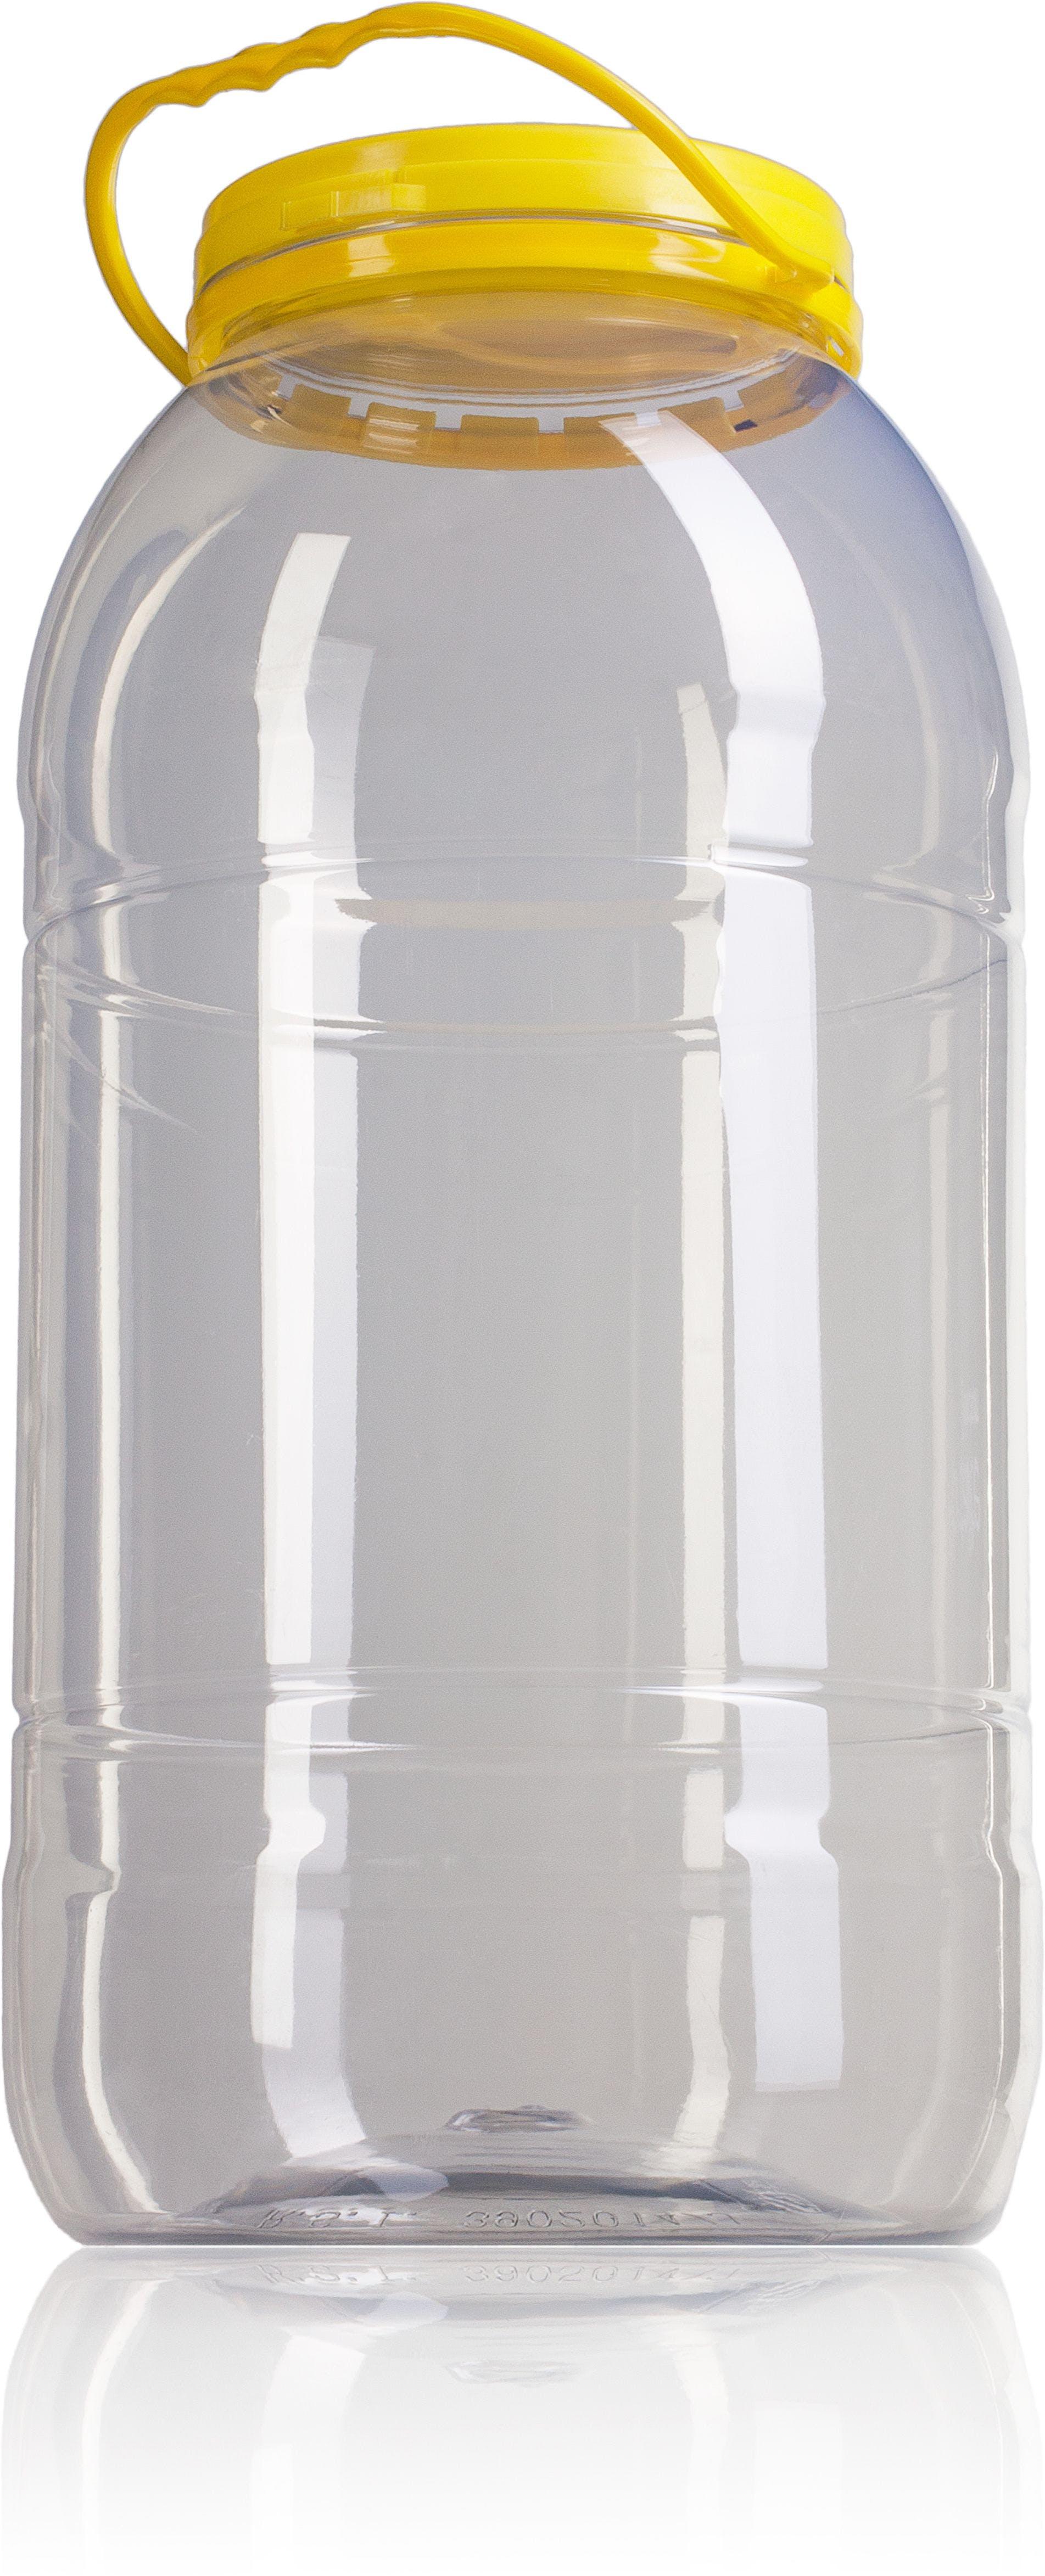 Garrafa PET 7,310 liters MetaIMGIn Garrafas y bidones de plastico